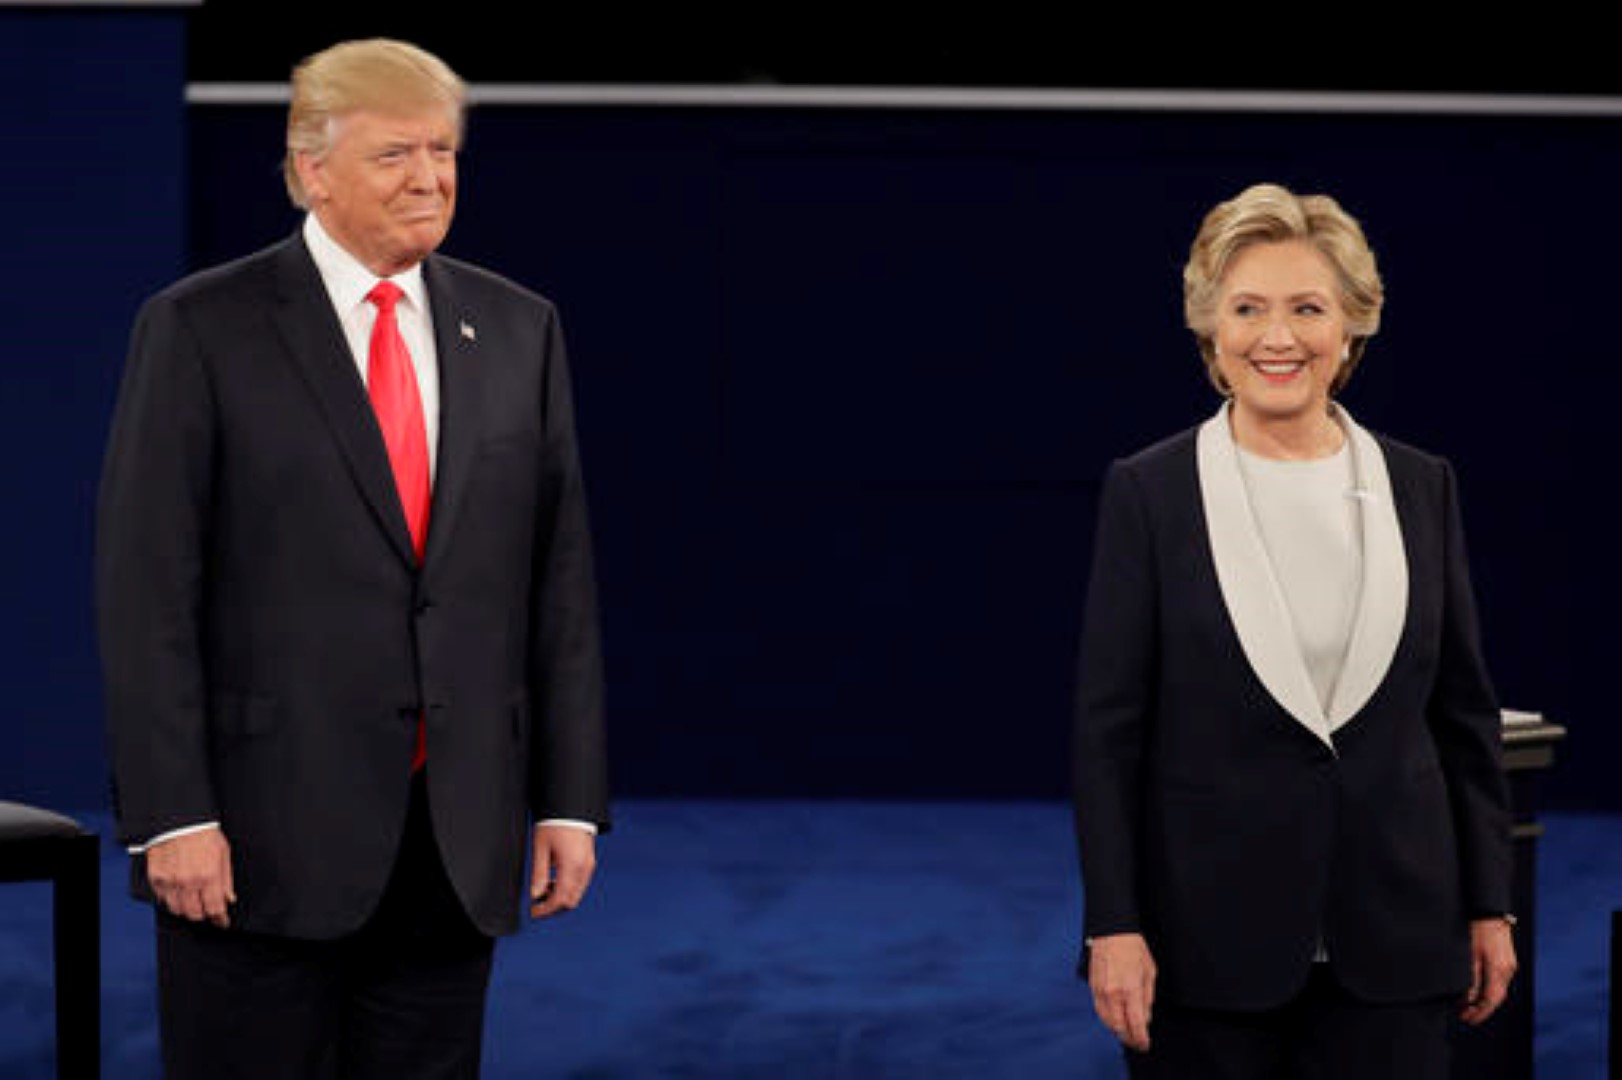 trump-clinton-debate-Large.jpg